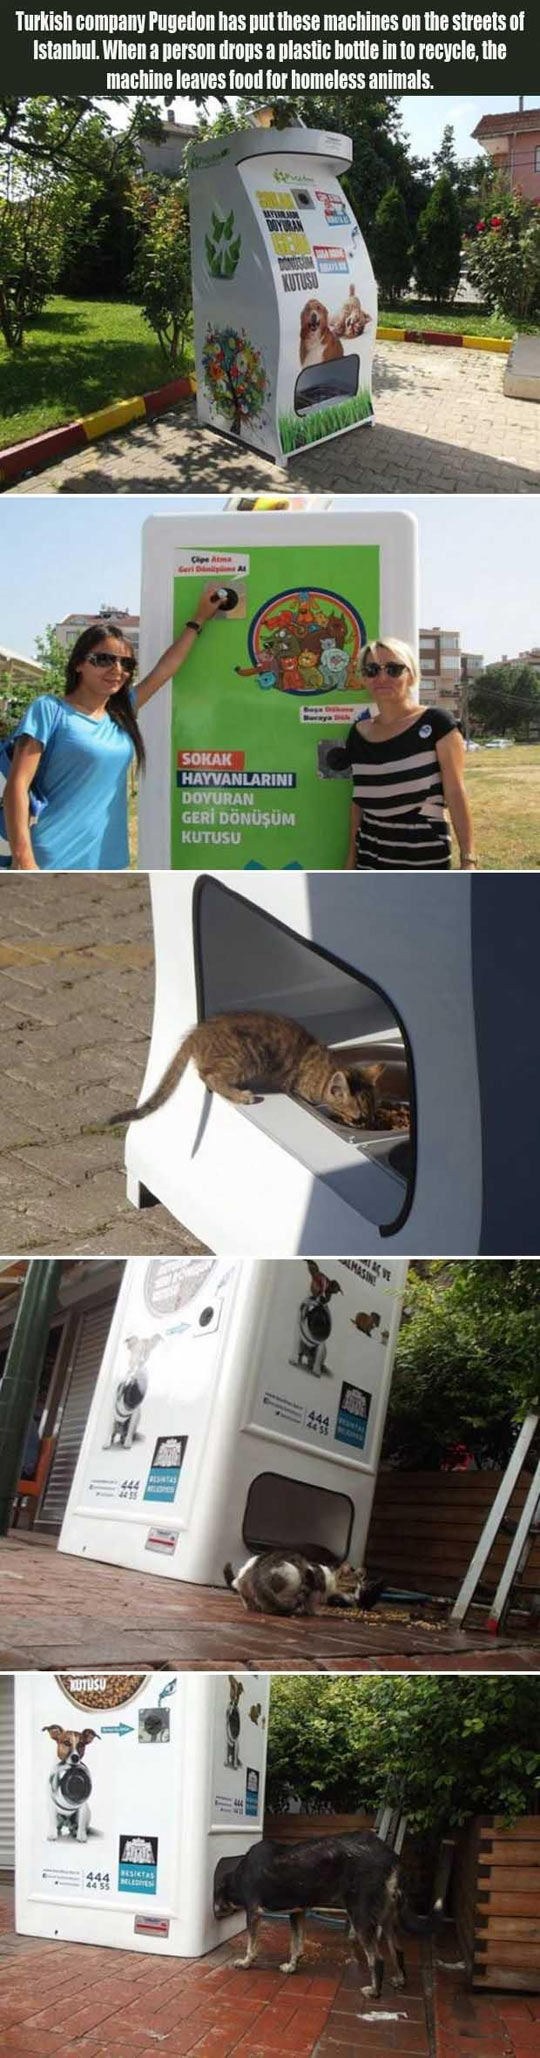 funny-vending-machine-homeless-animals